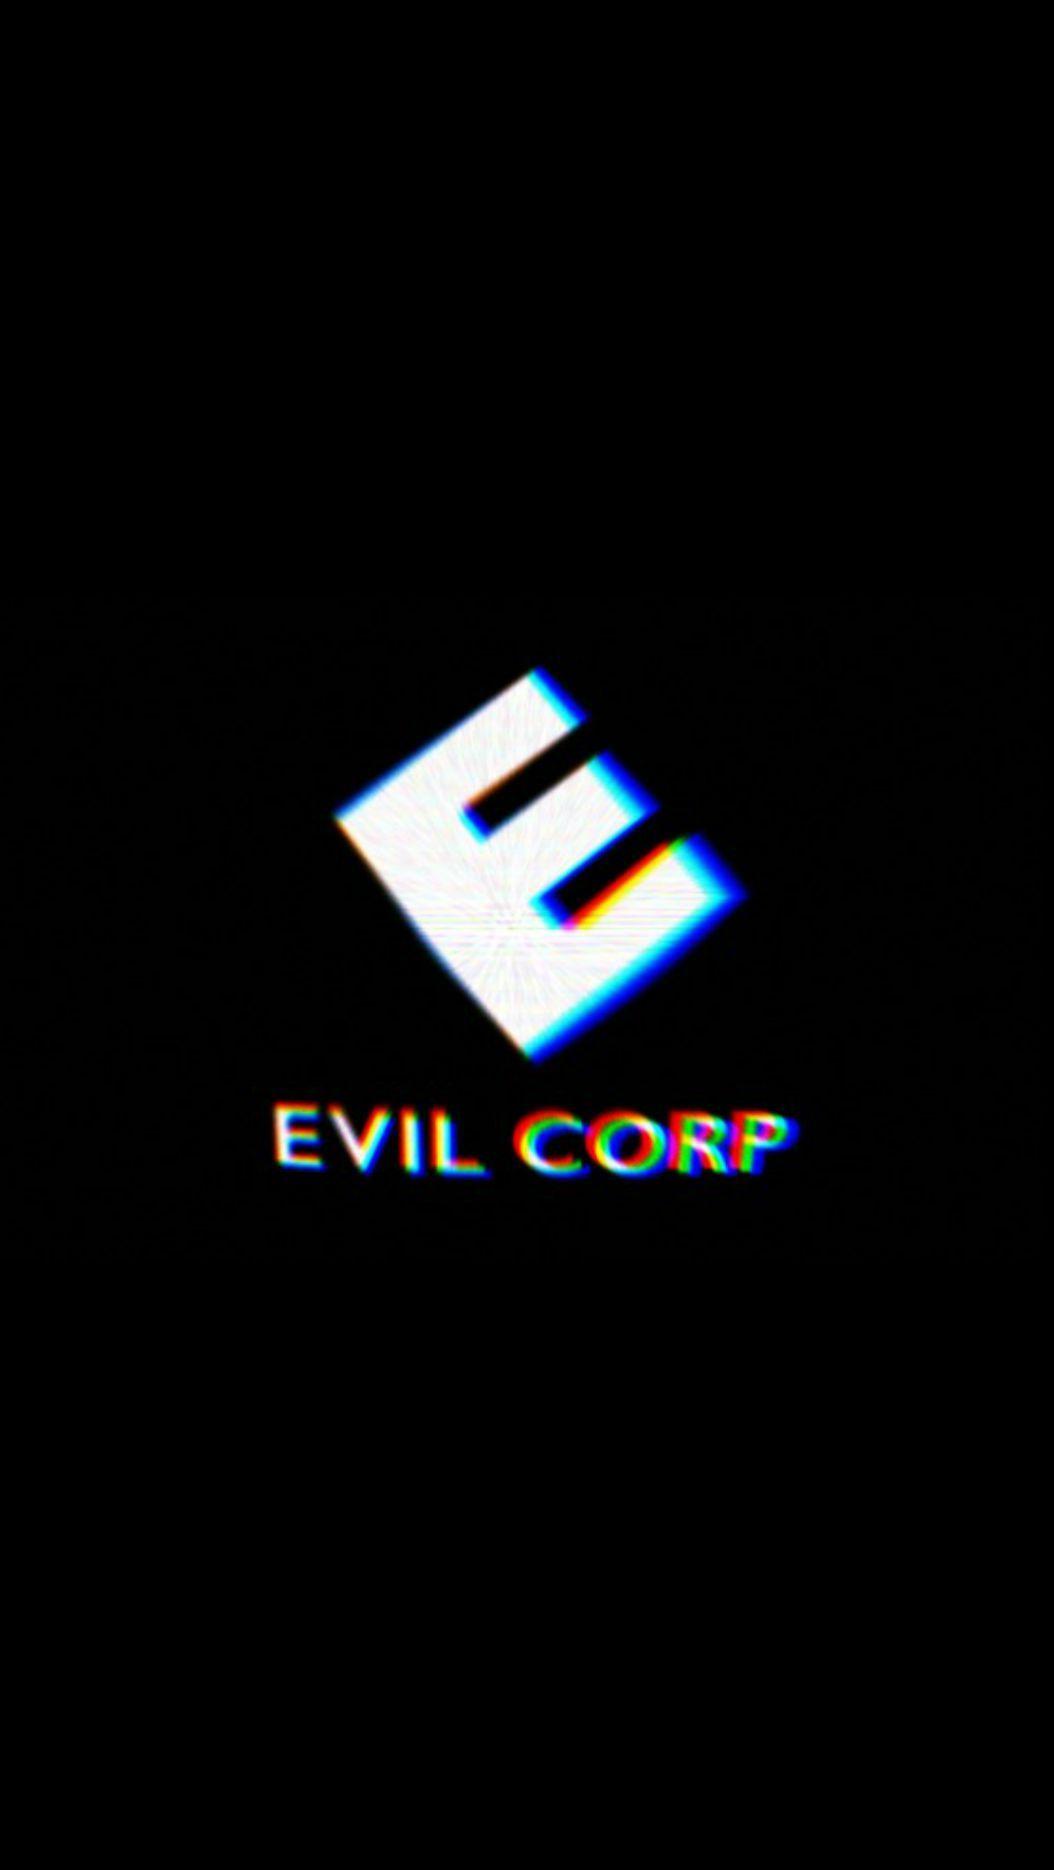 Evil Corp - Mr. Robot